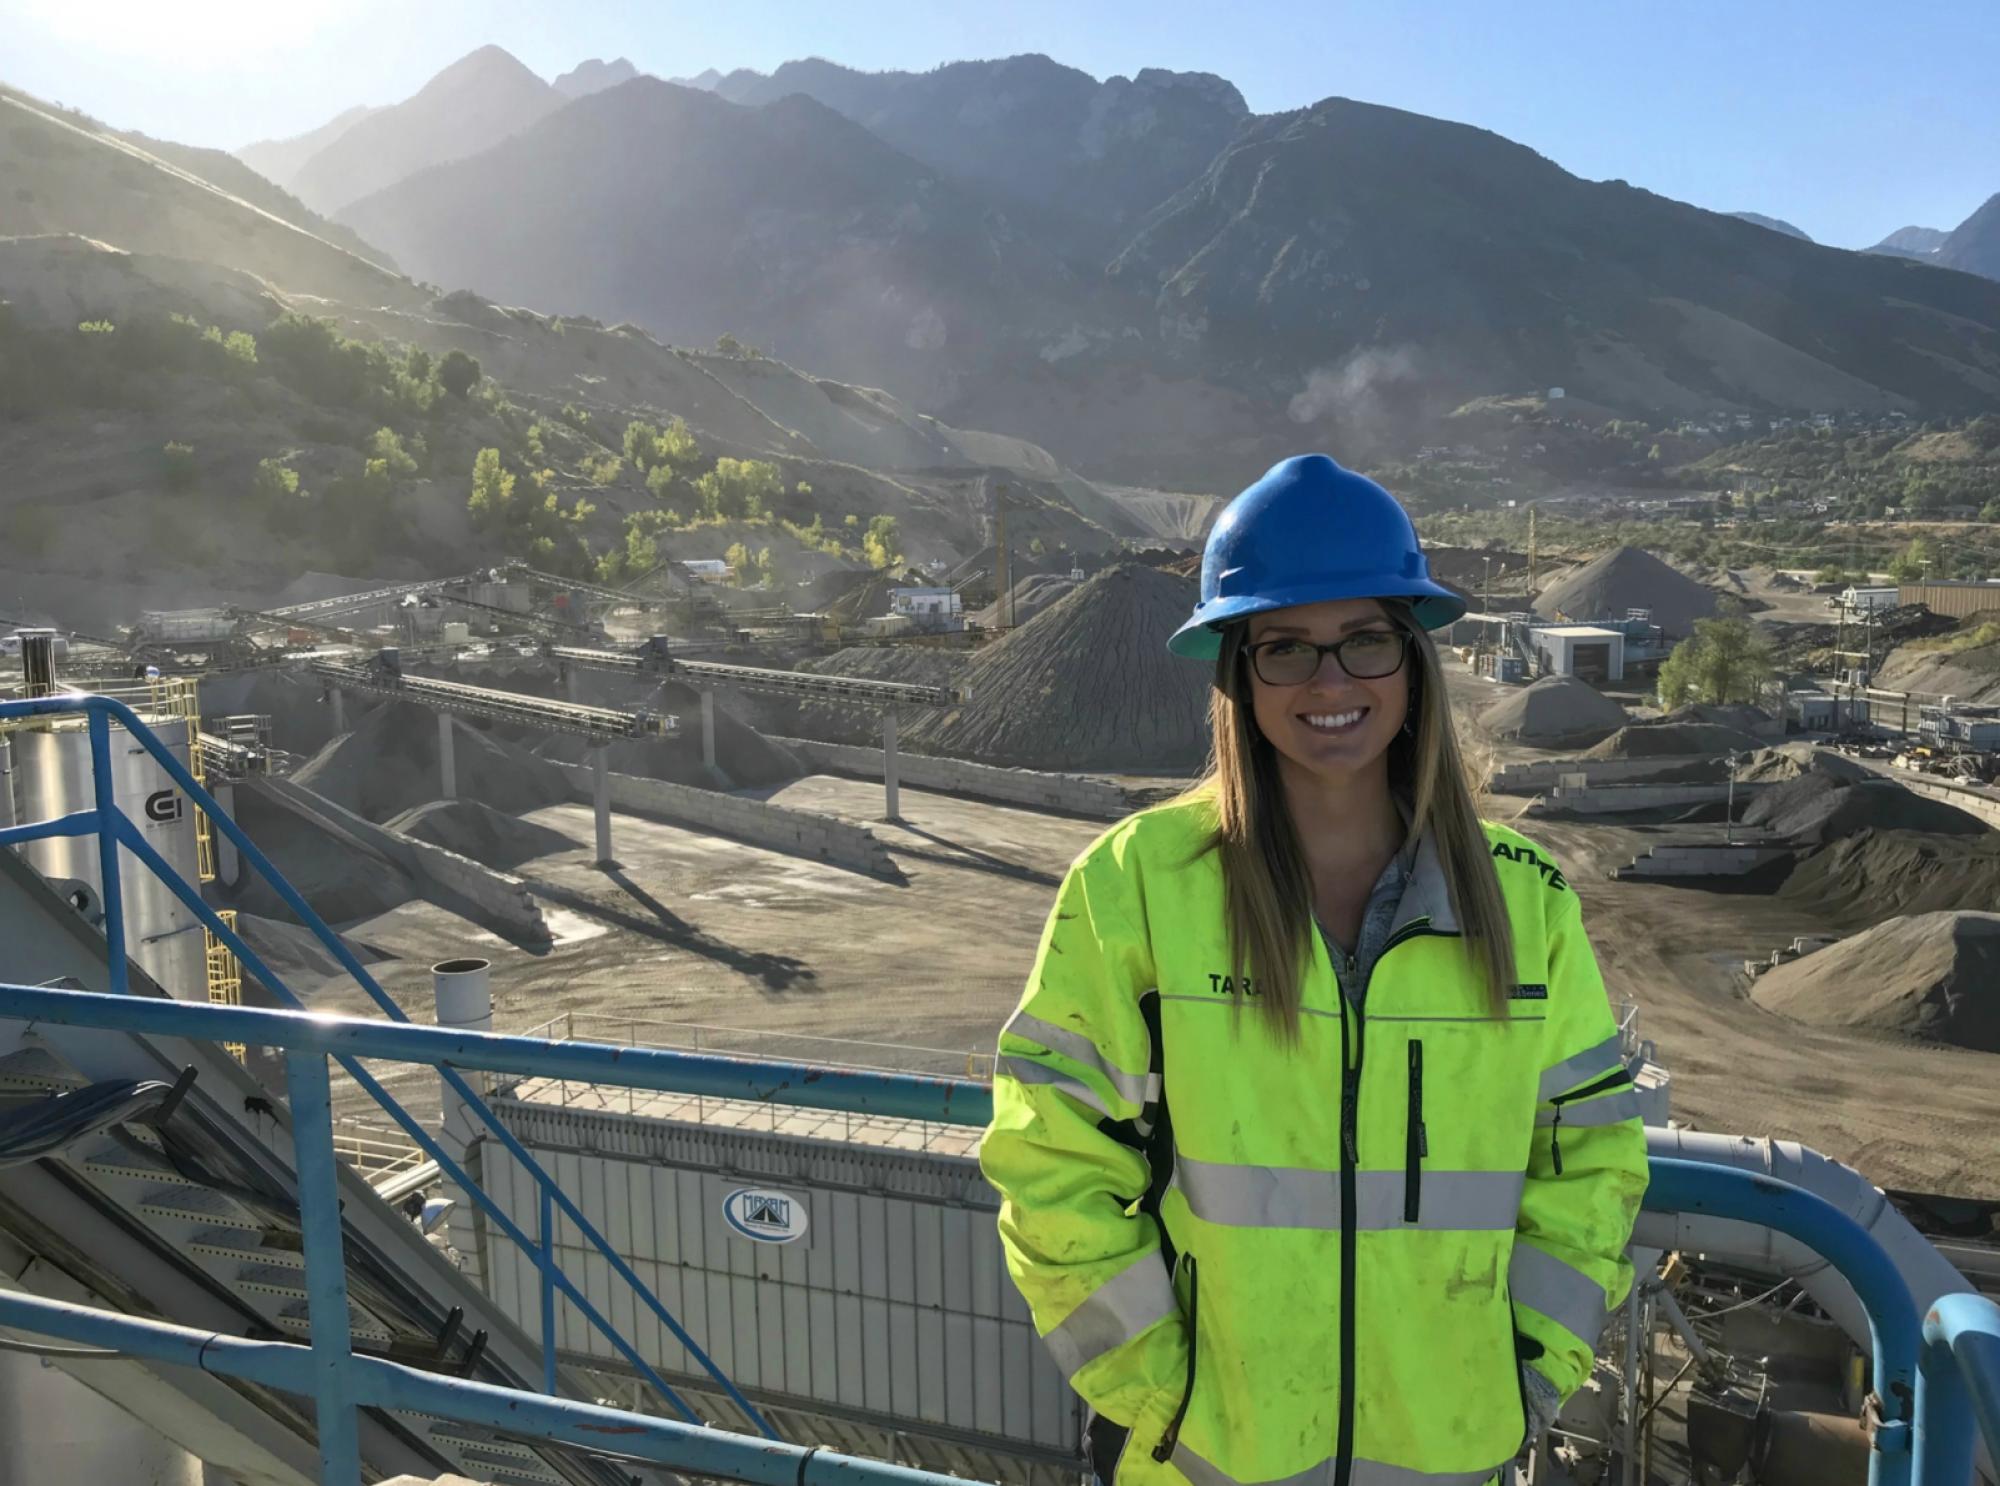 University of Arizona Mining Engineering Alumni at an Aggregate Mine